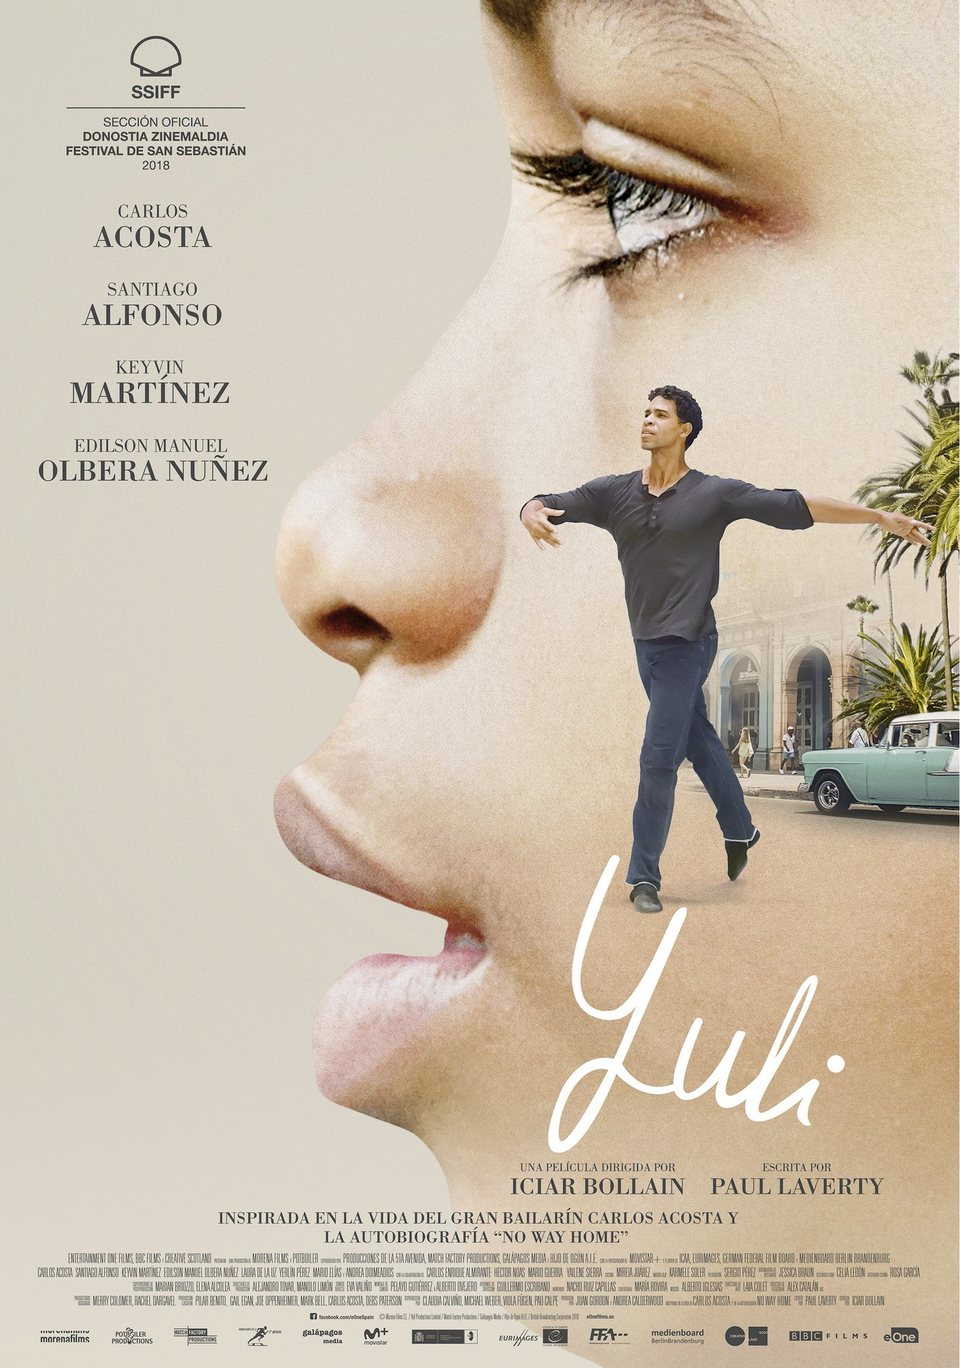 España poster for Yuli - The Carlos Acosta Story